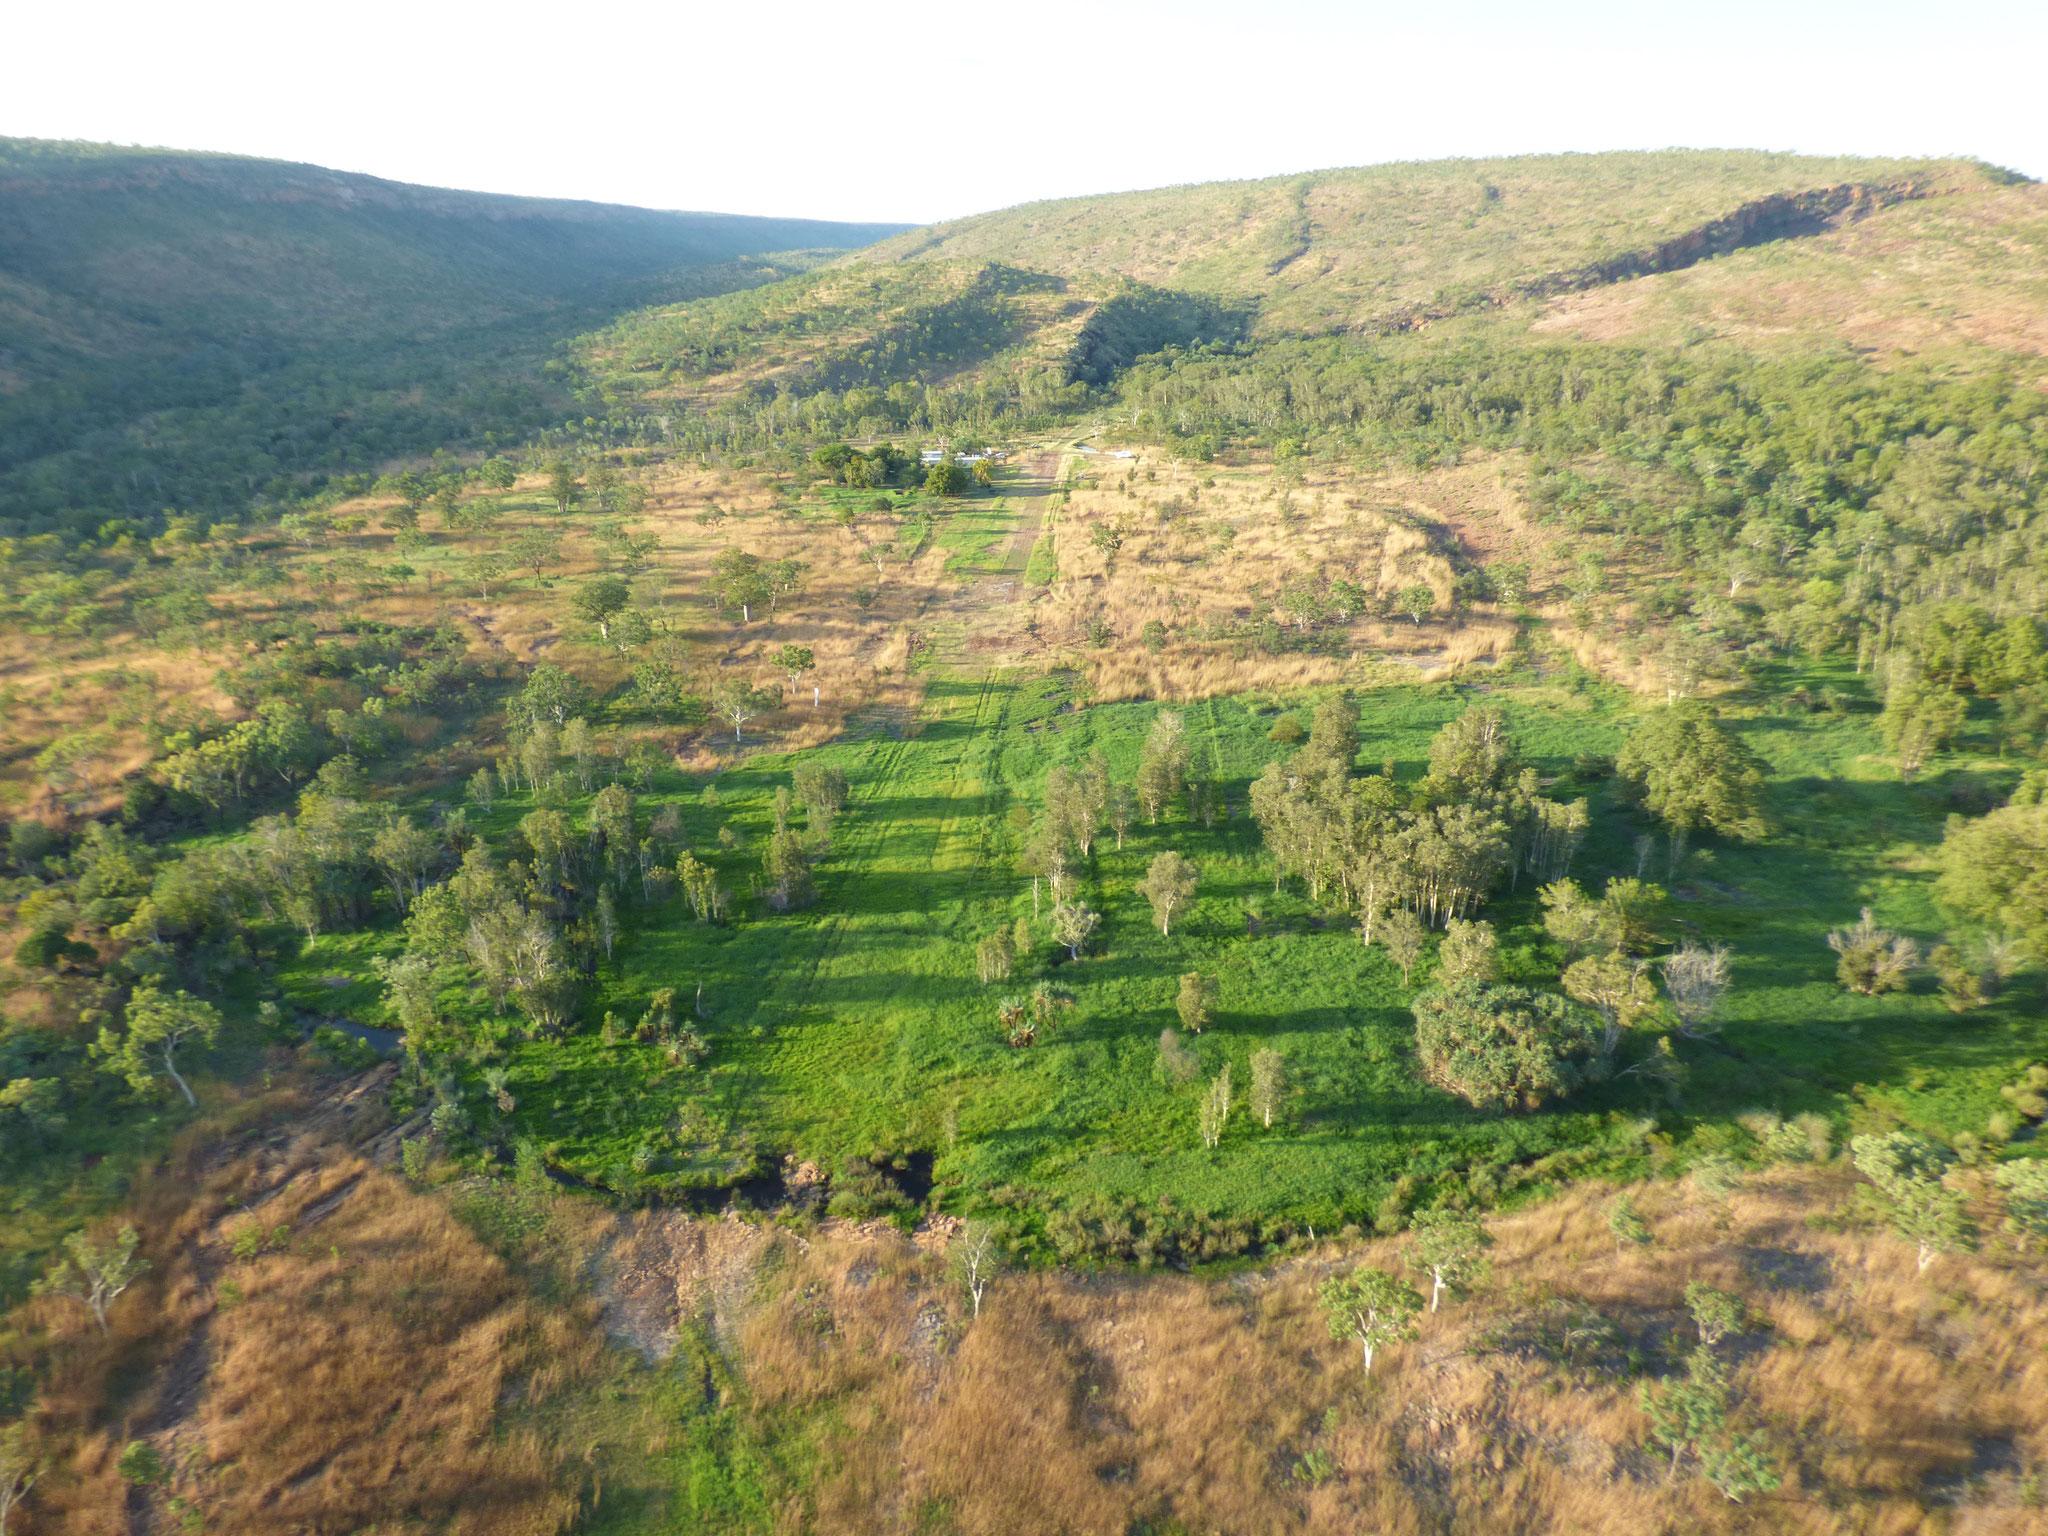 Rebuilding the main Cockatoo Creek carbon-sink has been rewarding work